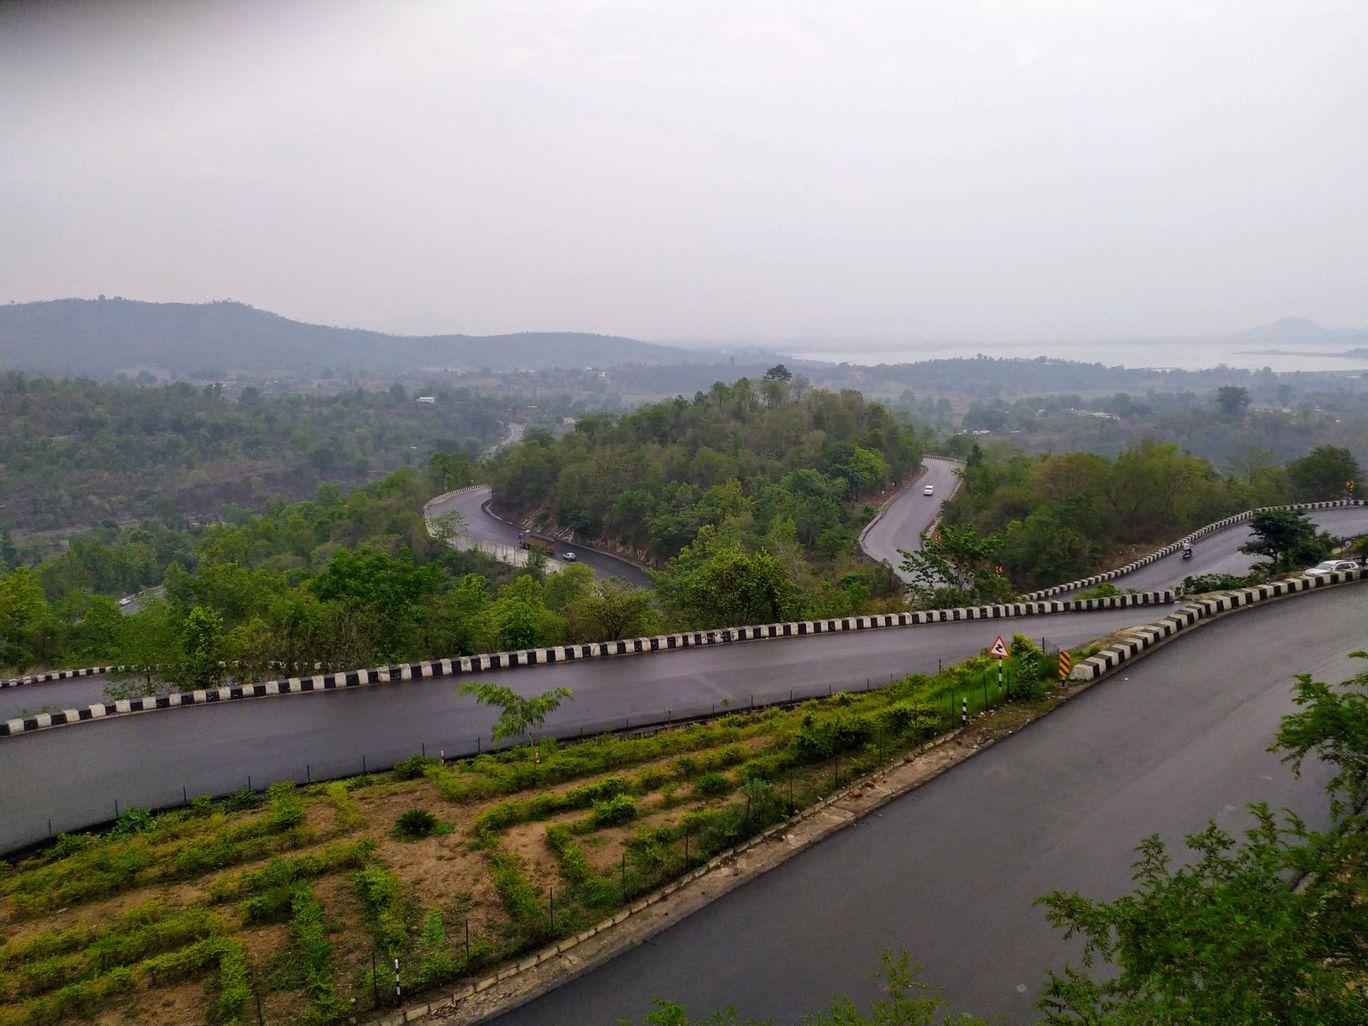 Photo of RR 3 By shivangi jaiswal